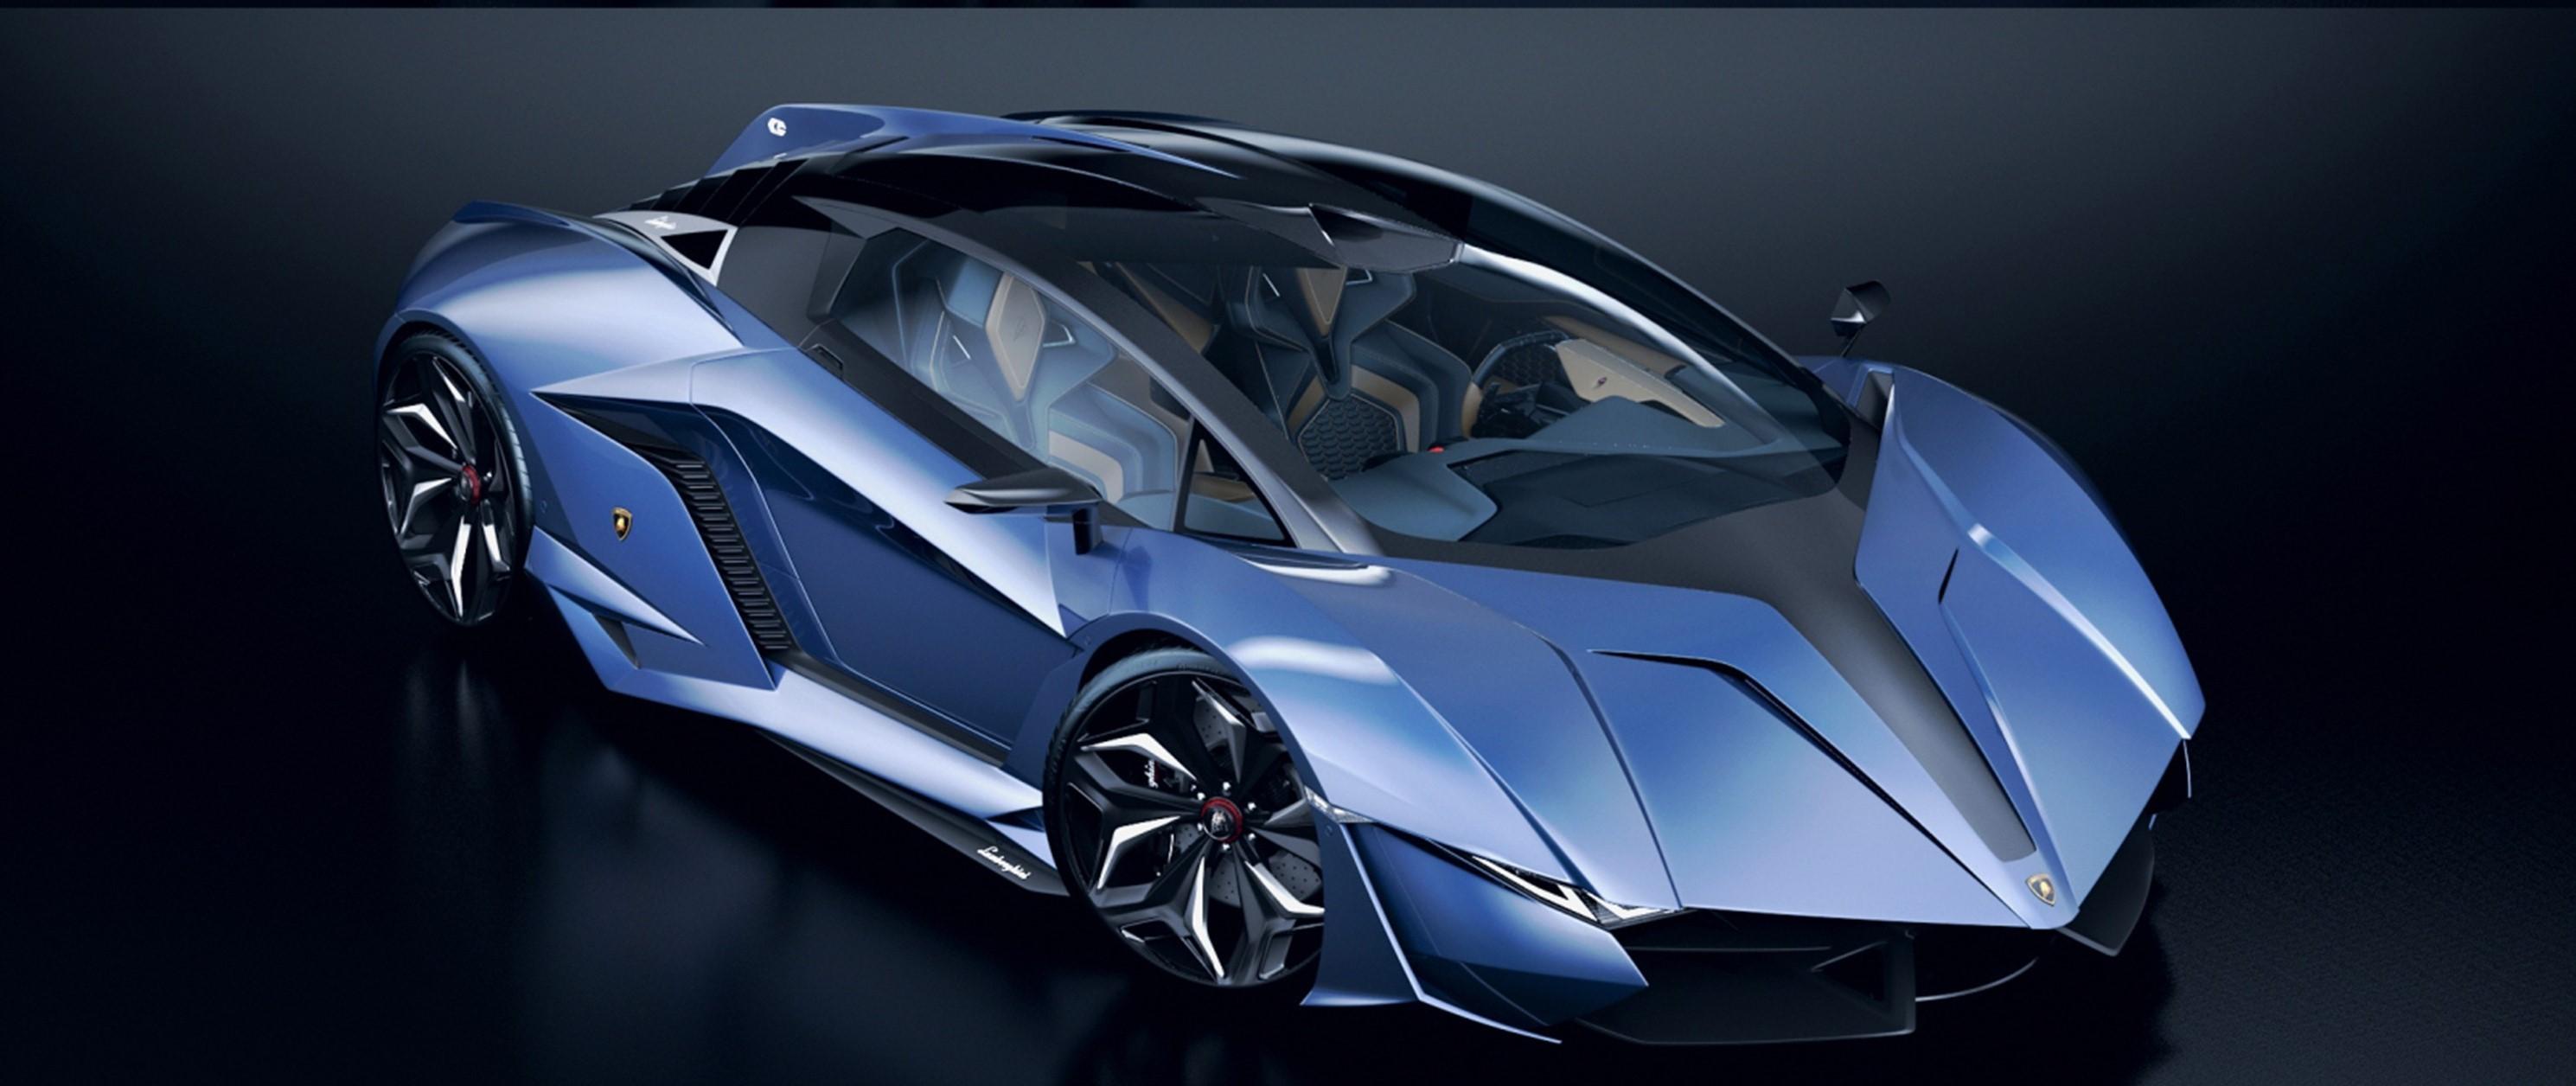 Wallpaper : concept cars, sports car, performance car ...